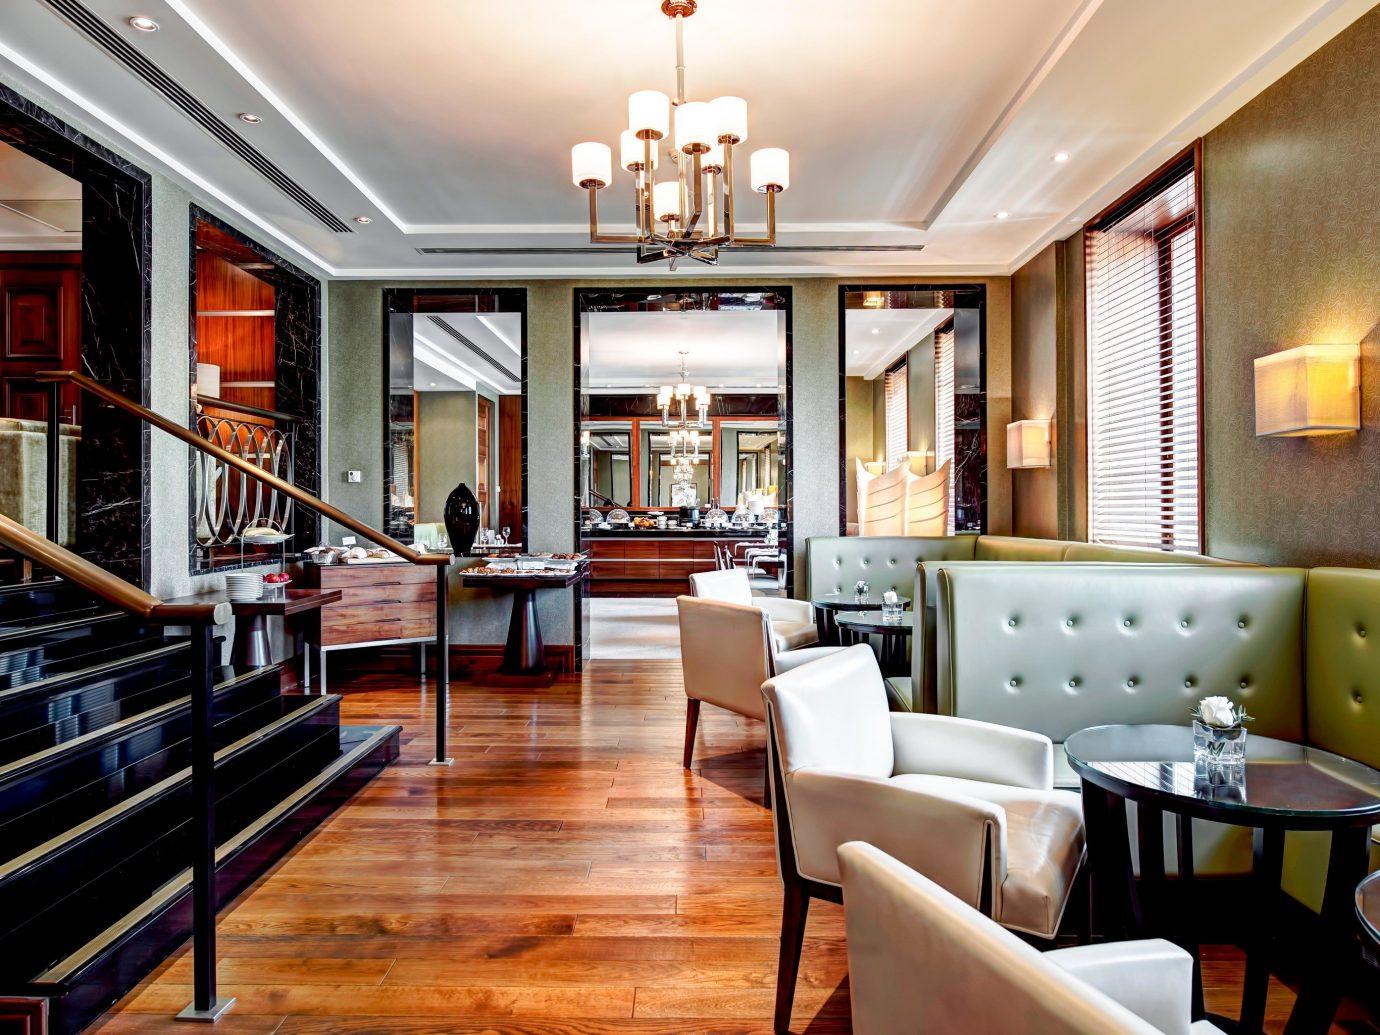 Hotels Luxury Travel indoor floor ceiling room interior design window Living Lobby restaurant living room real estate café apartment furniture wood